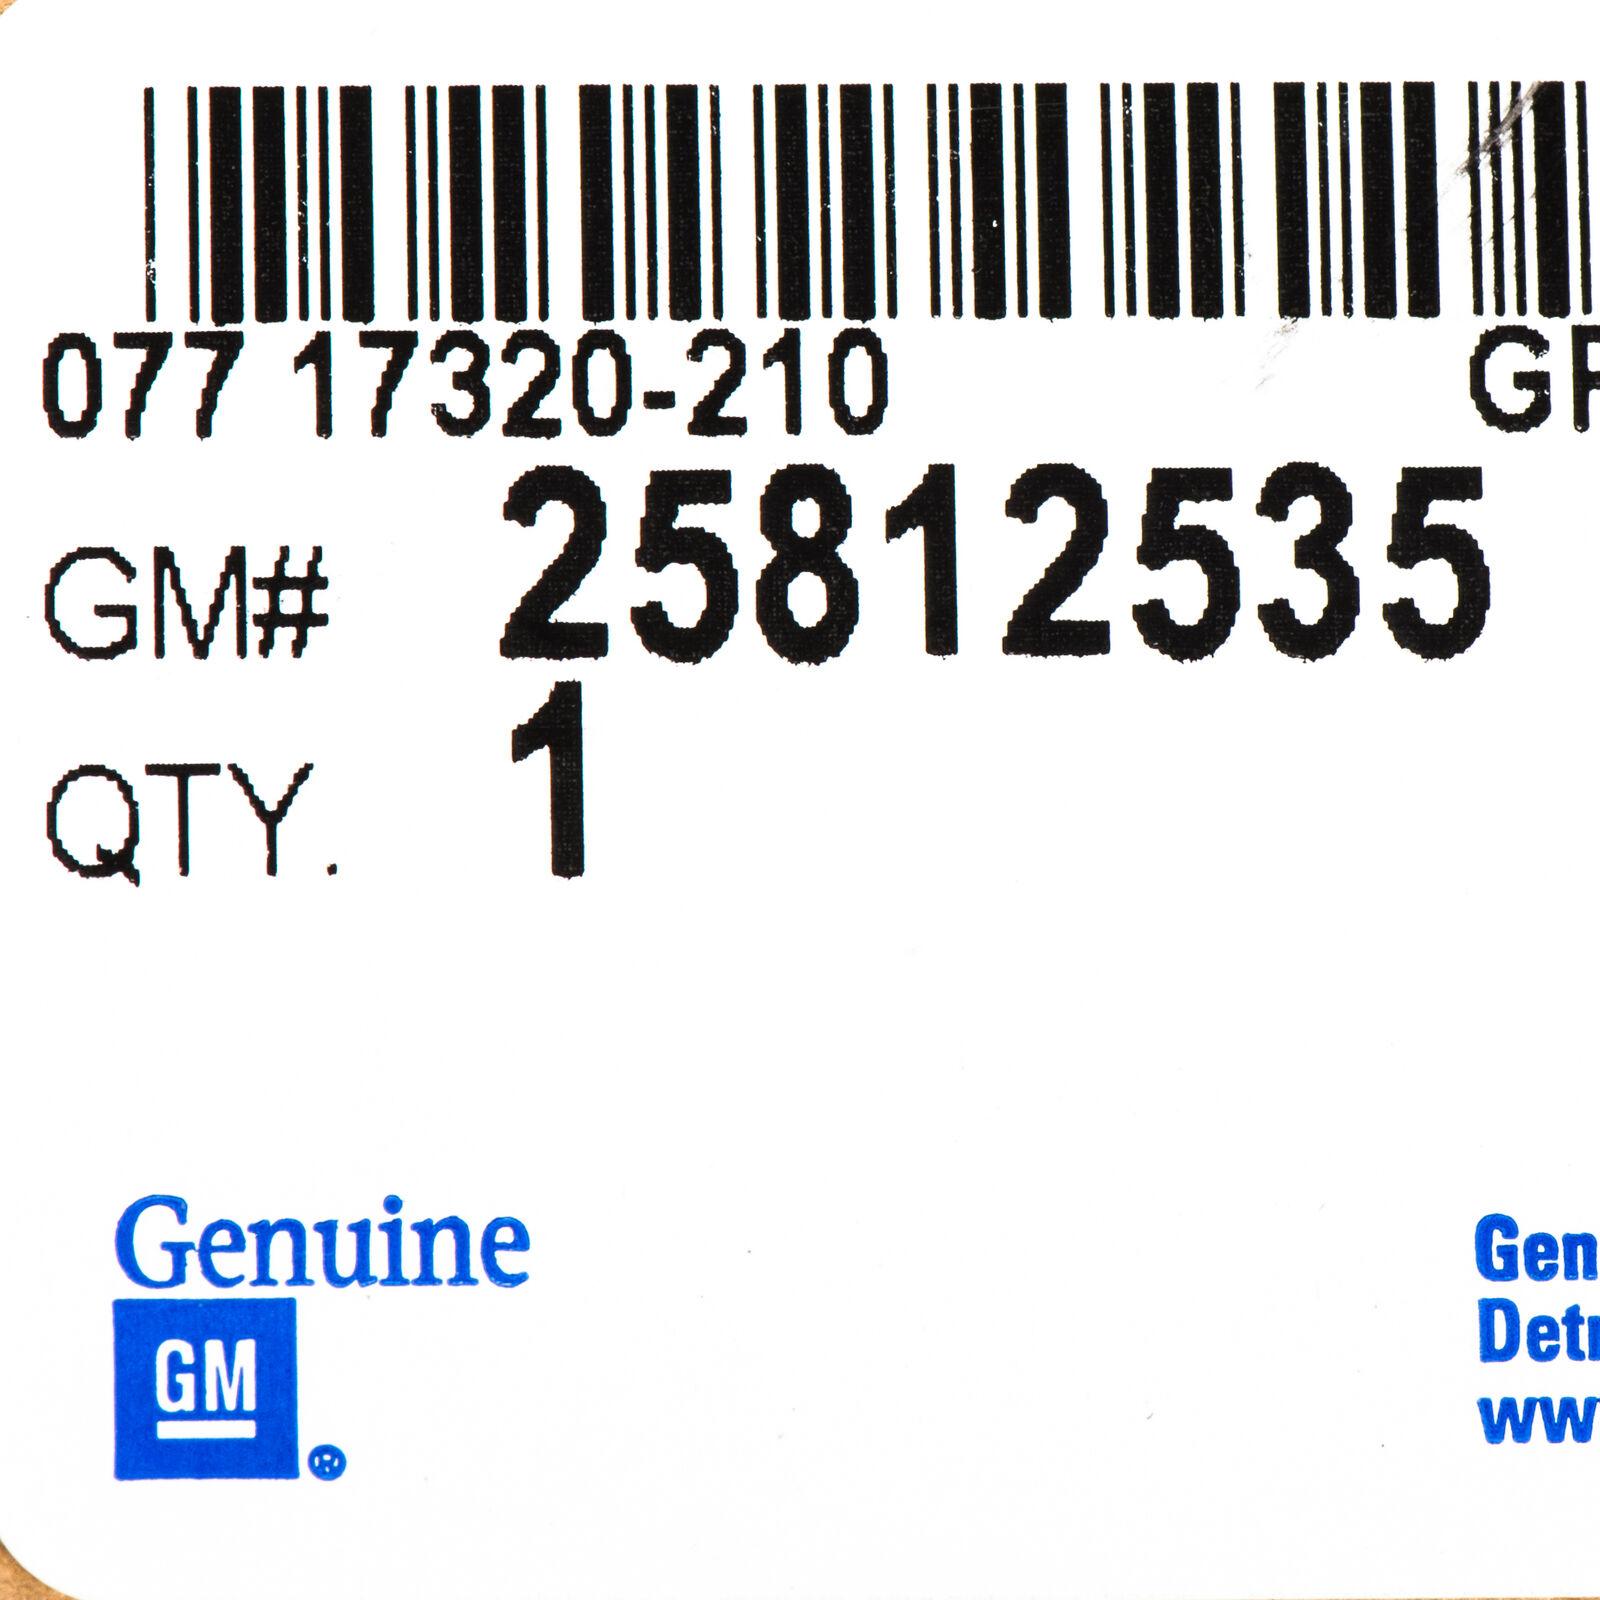 OEM NEW Rear Seat Arm Latch Cover Cashmere 07-14 Silverado Sierra 25812535